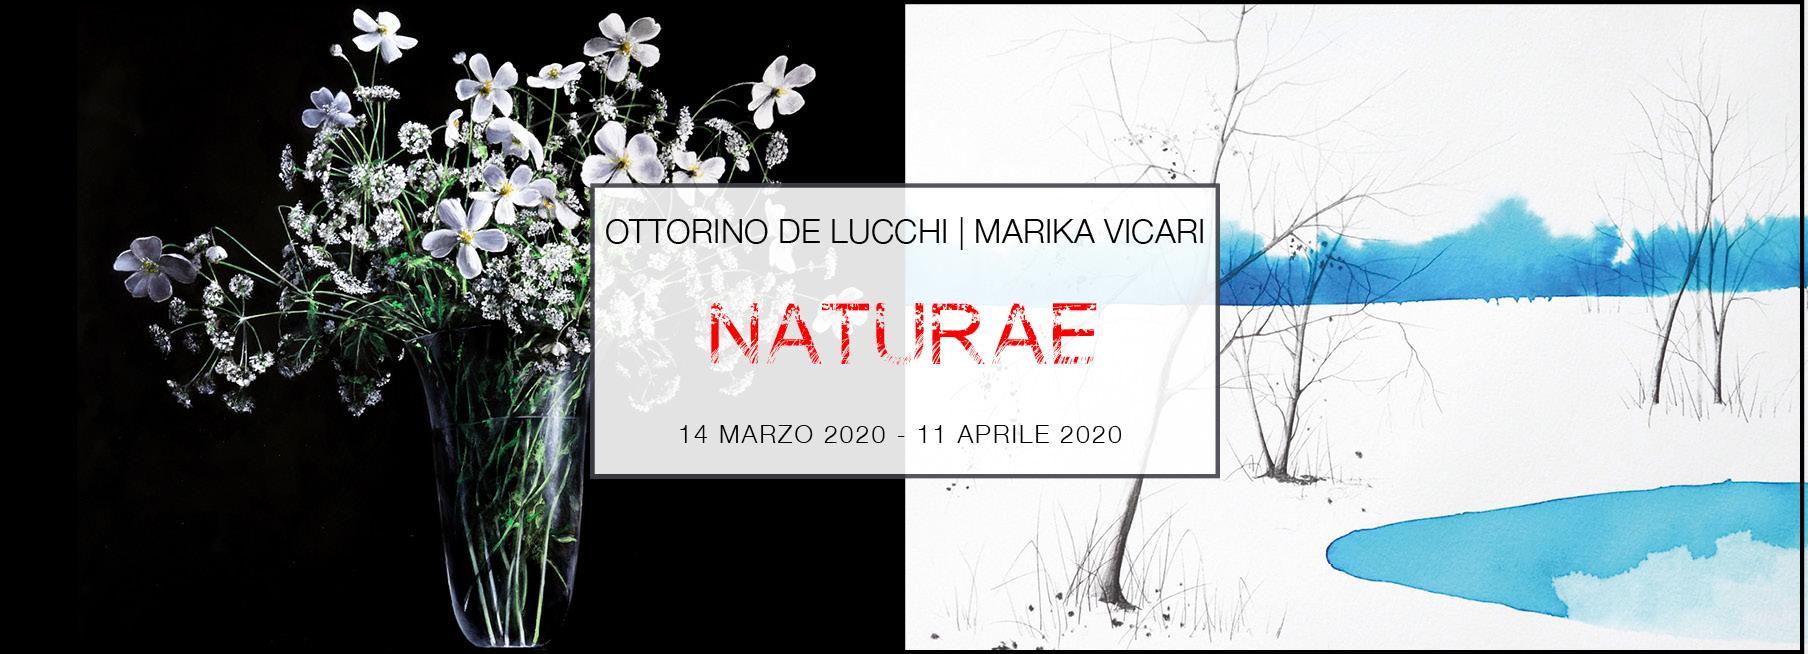 OTTORINO DE LUCCHI - MARIKA VICARI | NATURAE